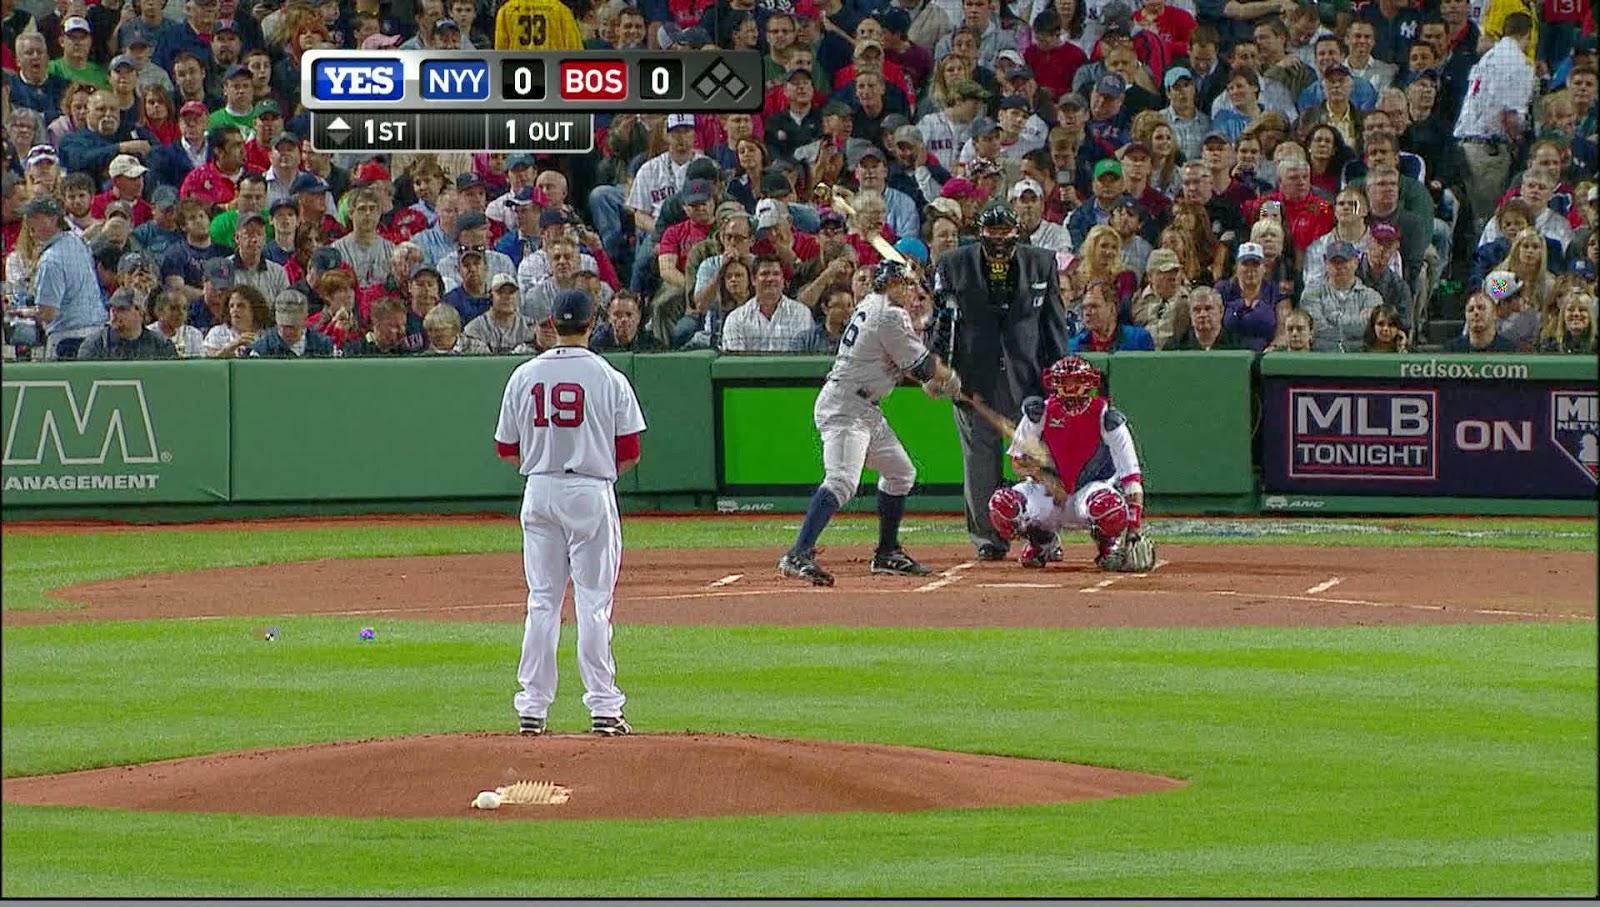 hd desktop wallpaper baseball - photo #35